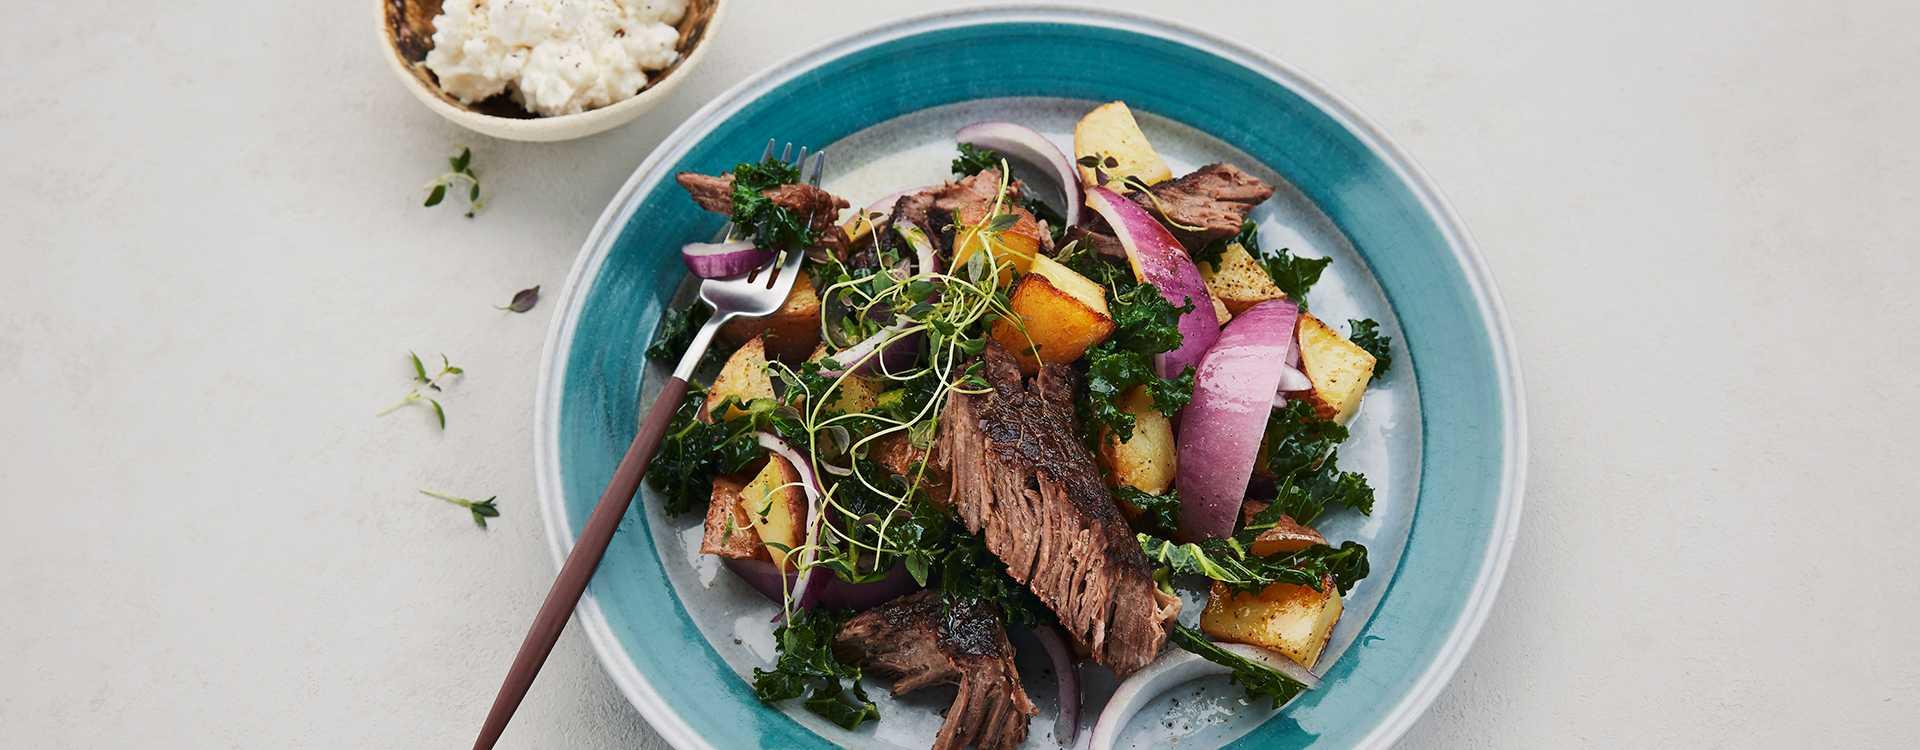 Lun salat med ristede poteter, høyrygg og fetaostkrem